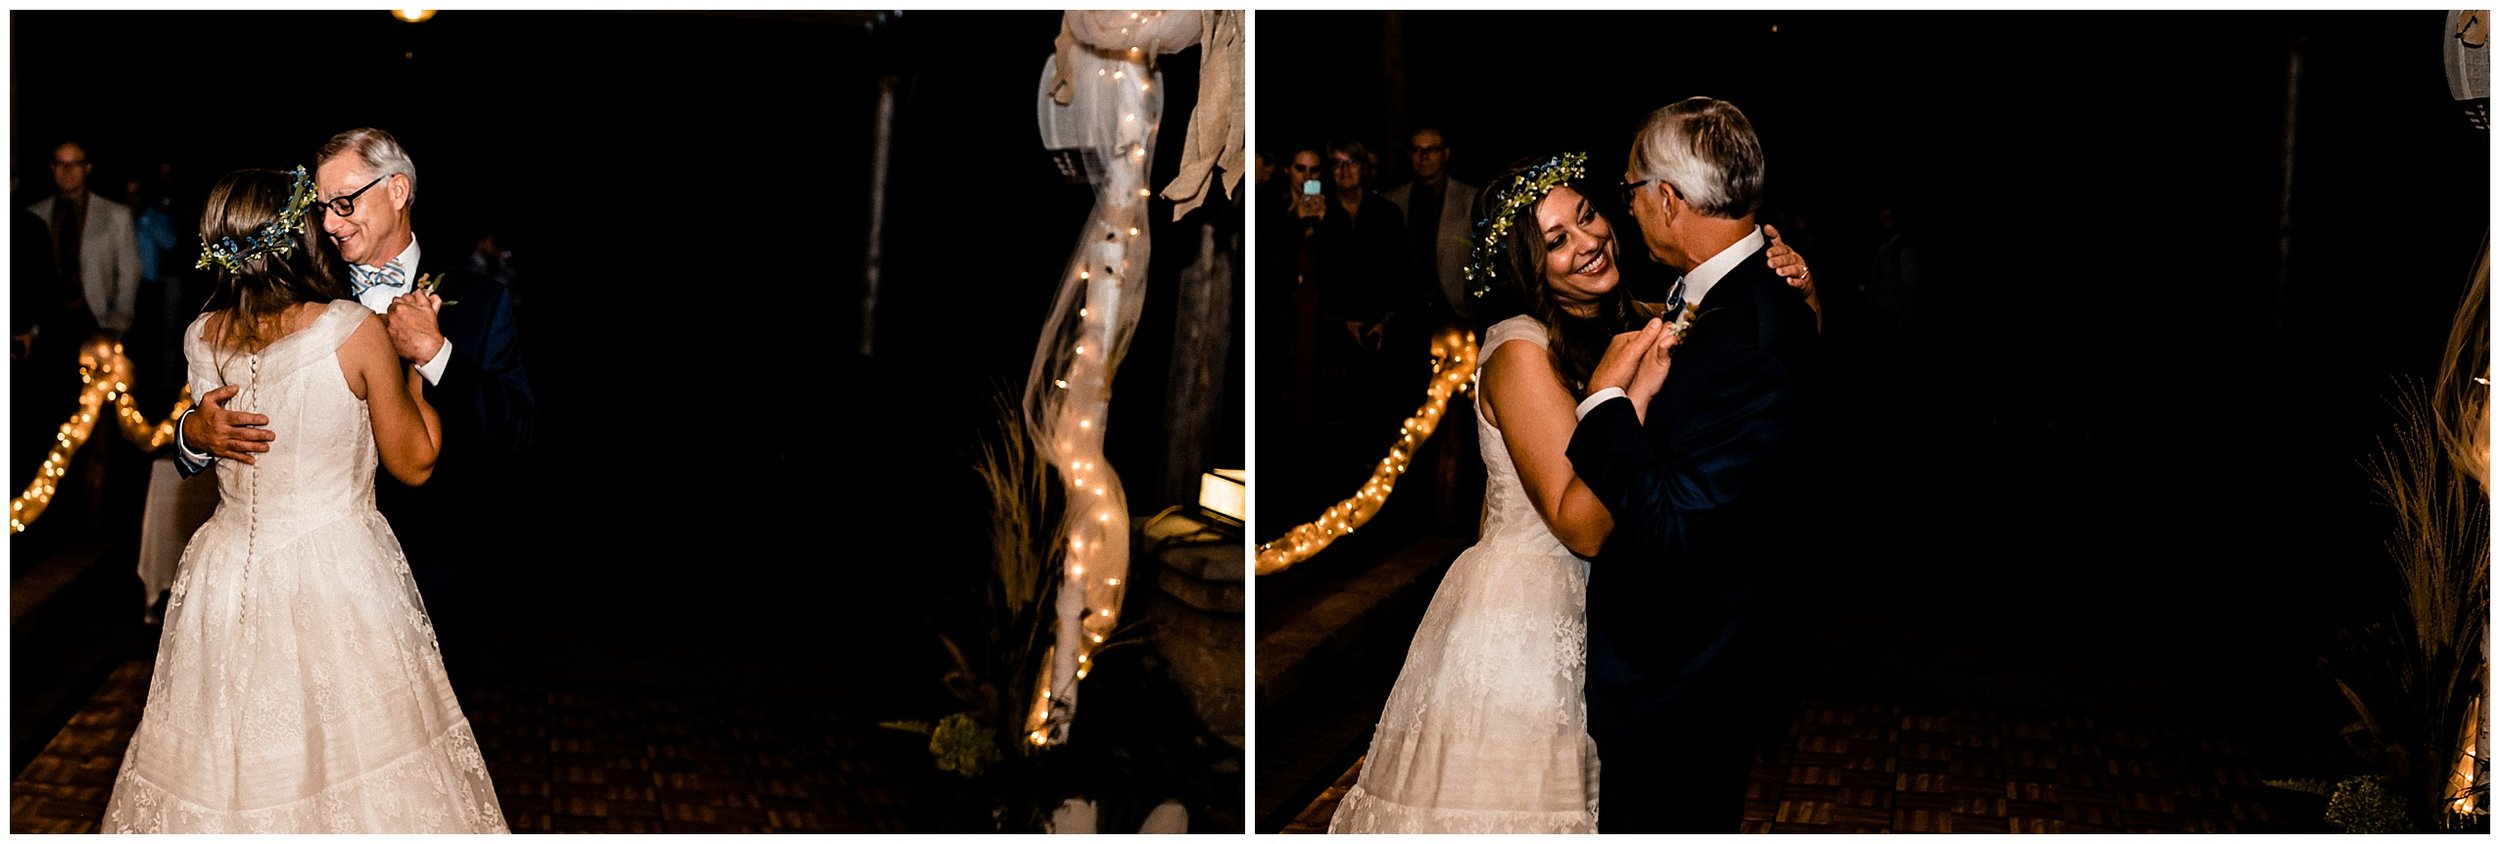 Jerod + Ashley | Just Married #kyleepaigephotography_1832.jpg